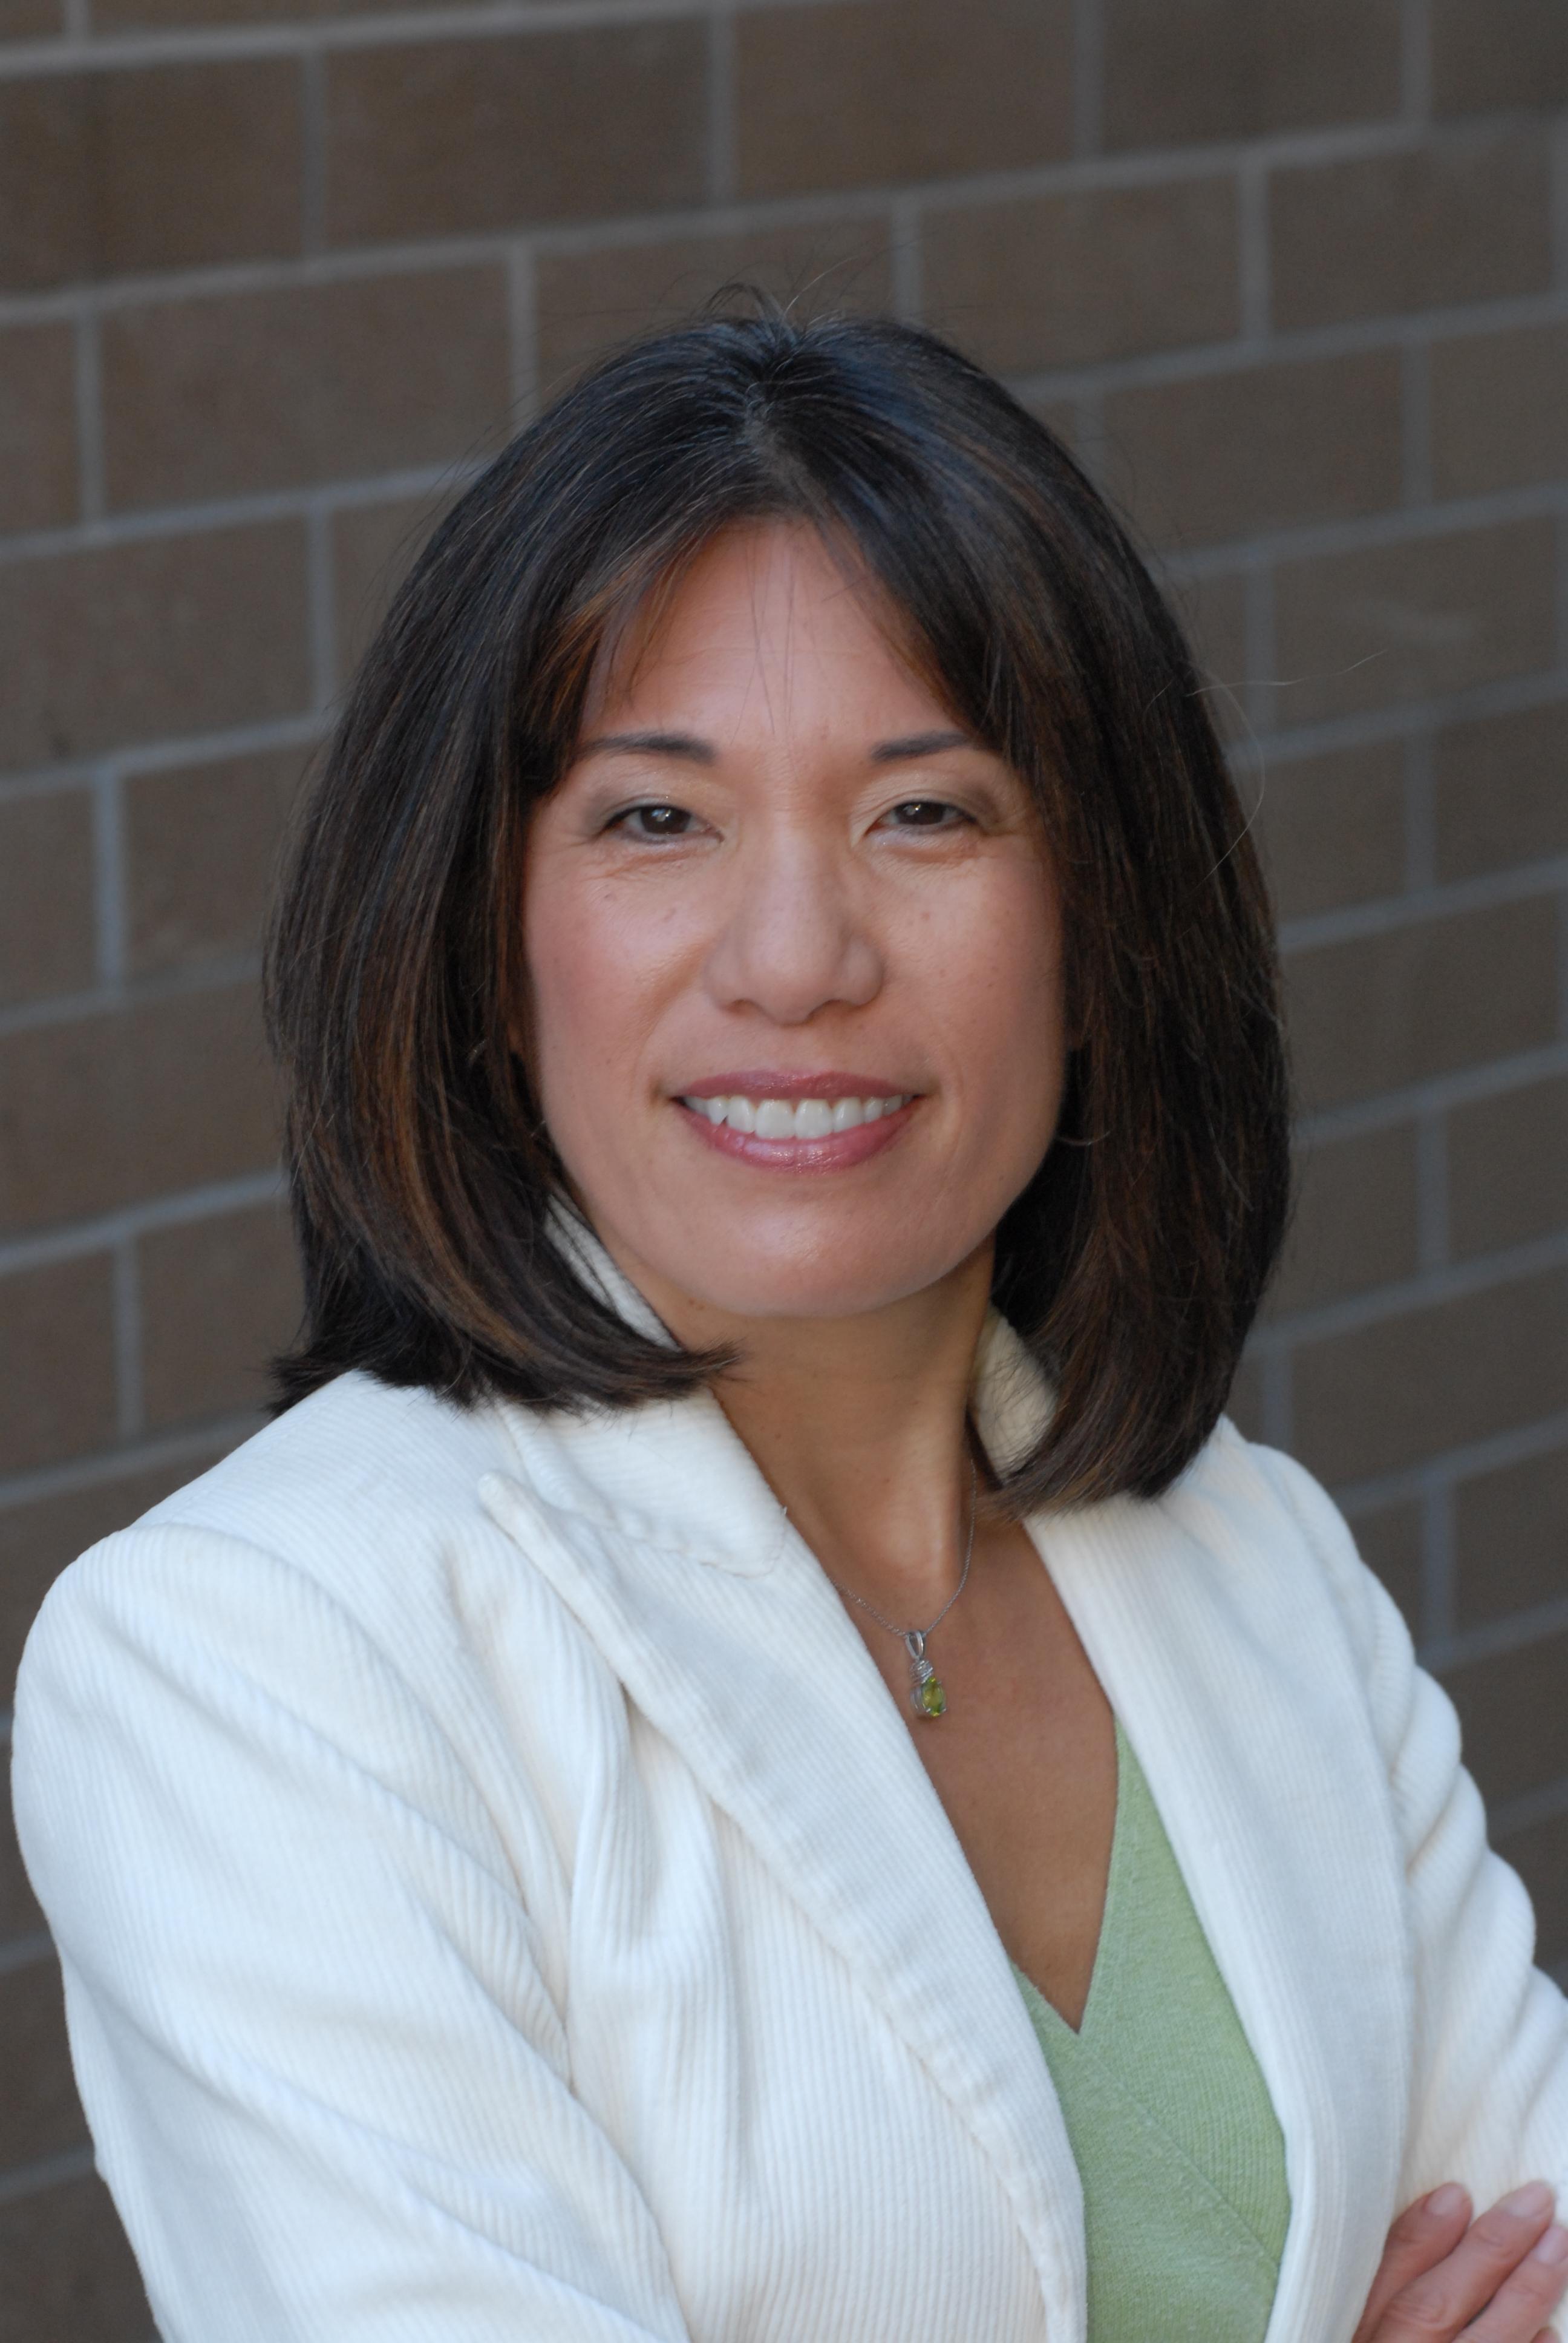 Karen Gee-McAuley, executive vice president, BLAZE PR